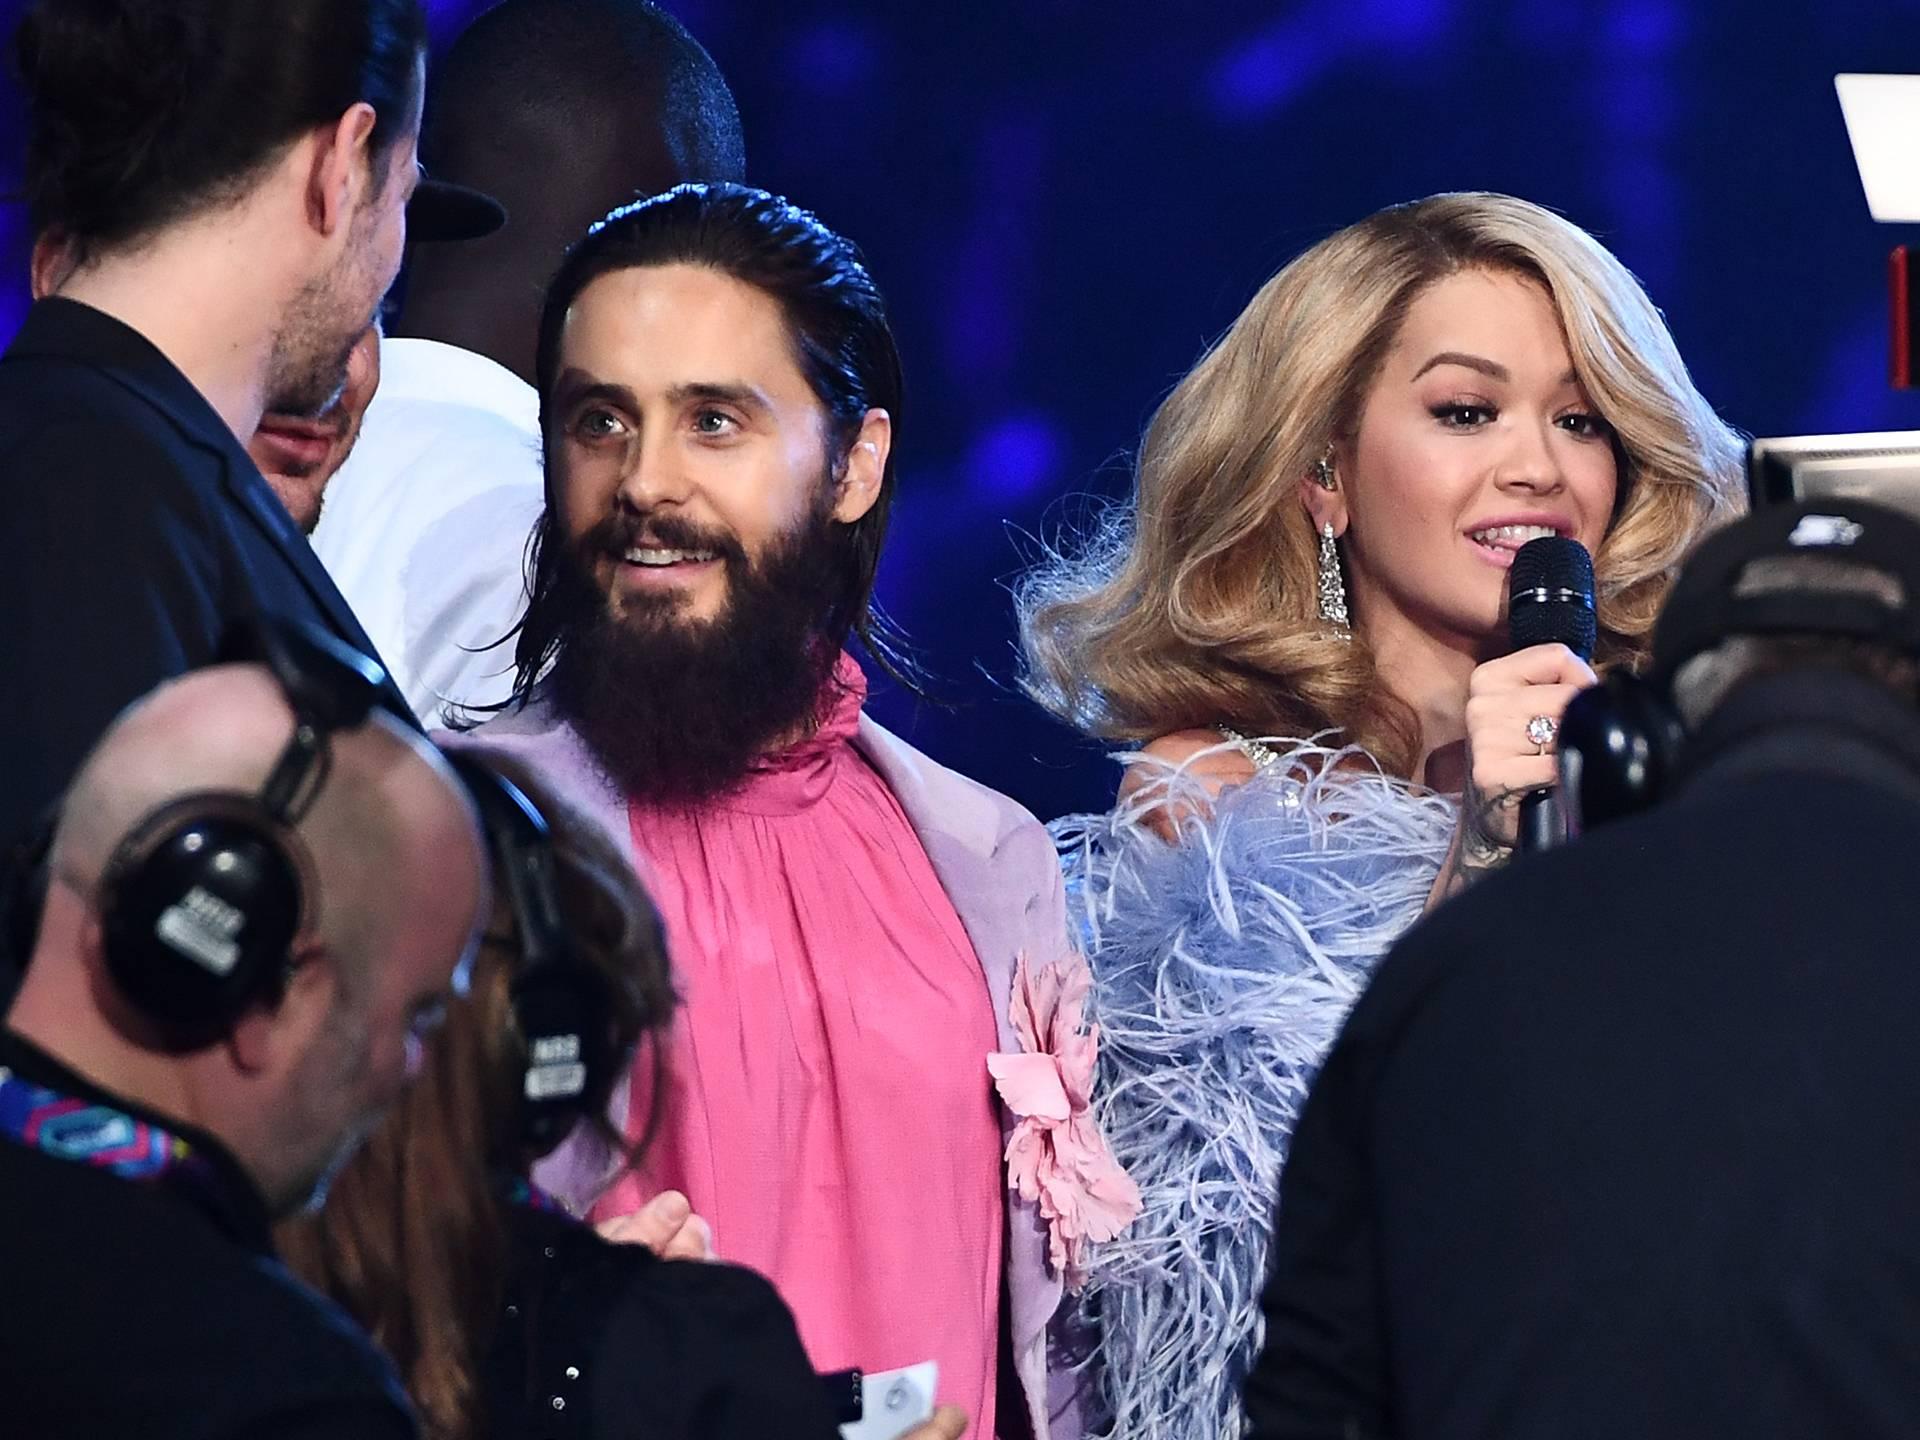 Jared Leto & Rita Ora